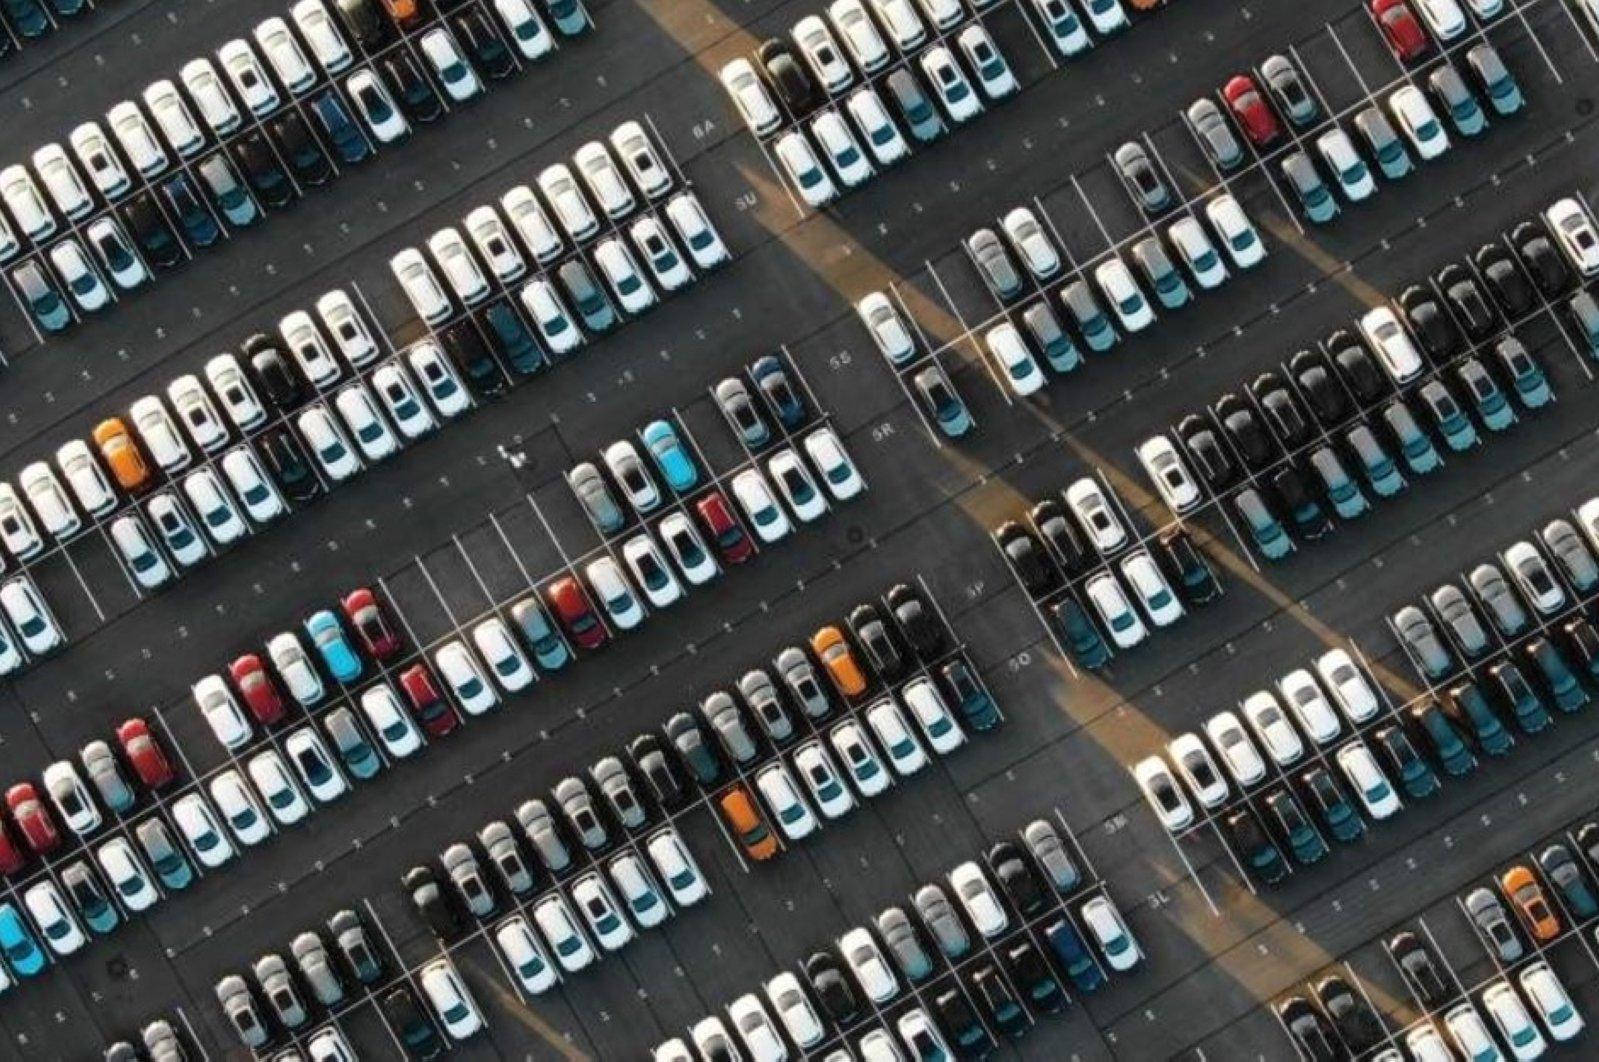 Auto sales in Turkey increased during the first quarter of 2020 despite the coronavirus measures. (Elena Perova / iStock)